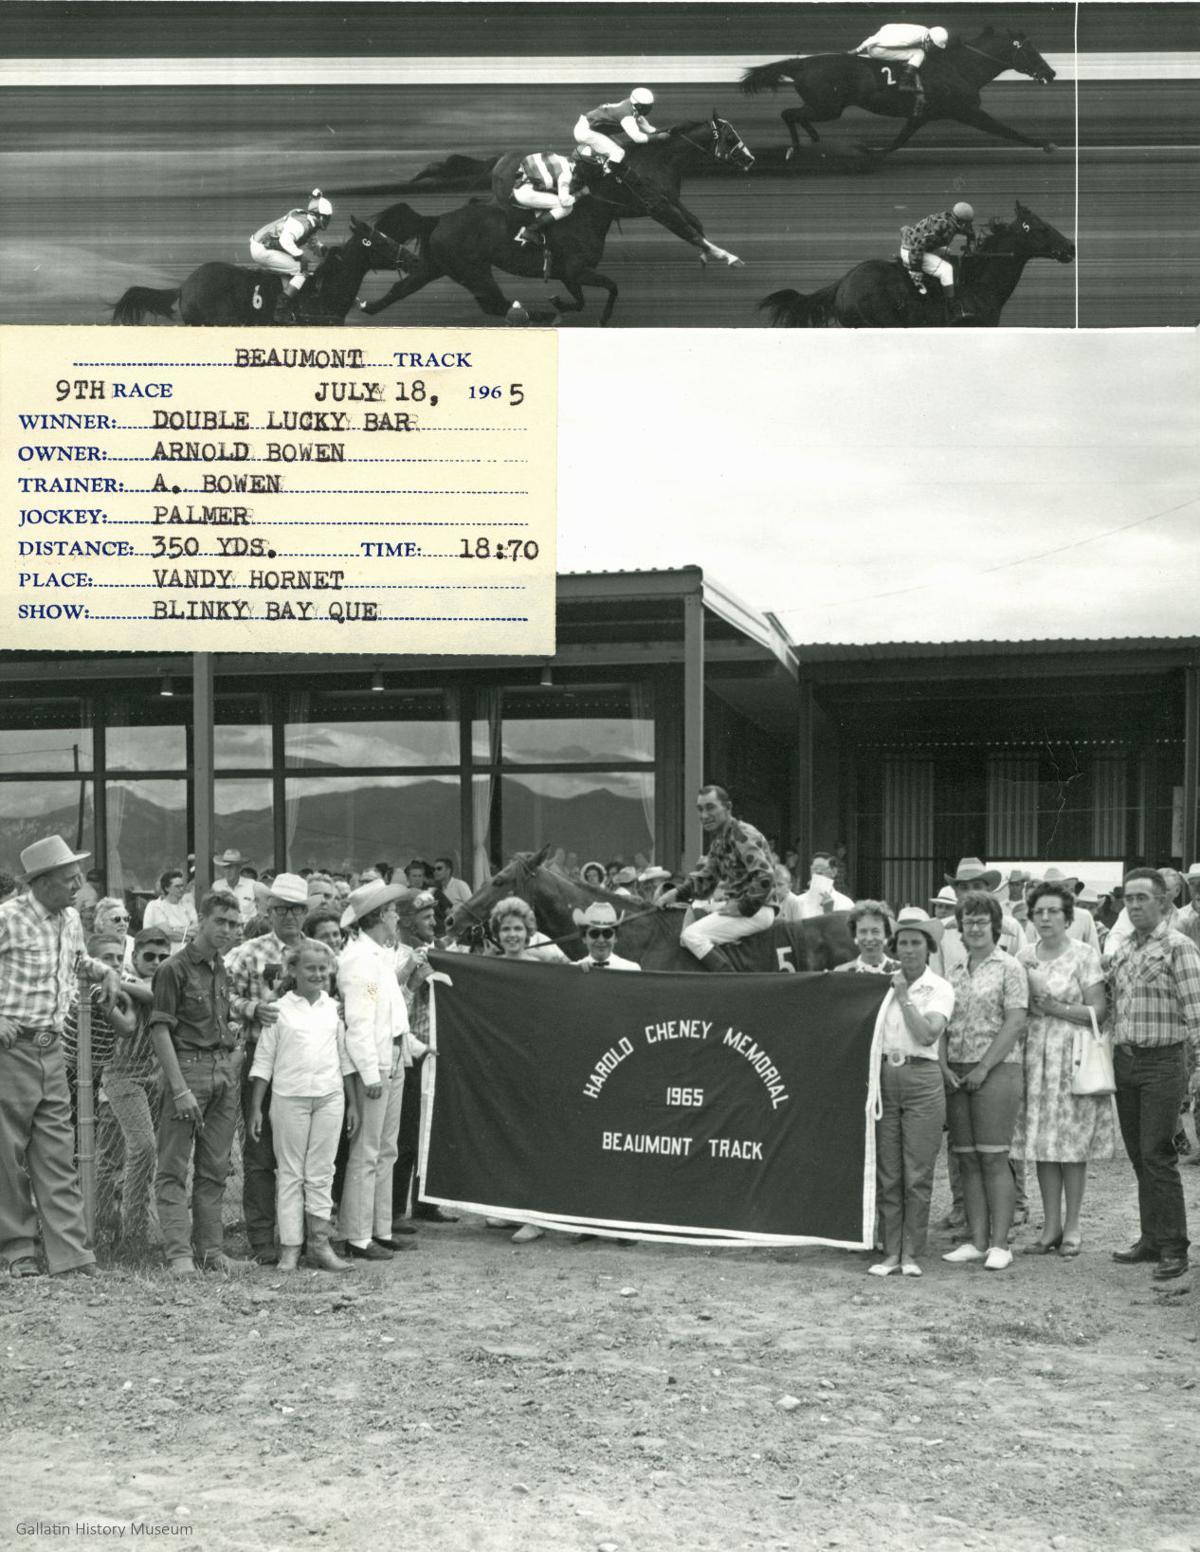 Beaumont track Horse jockey